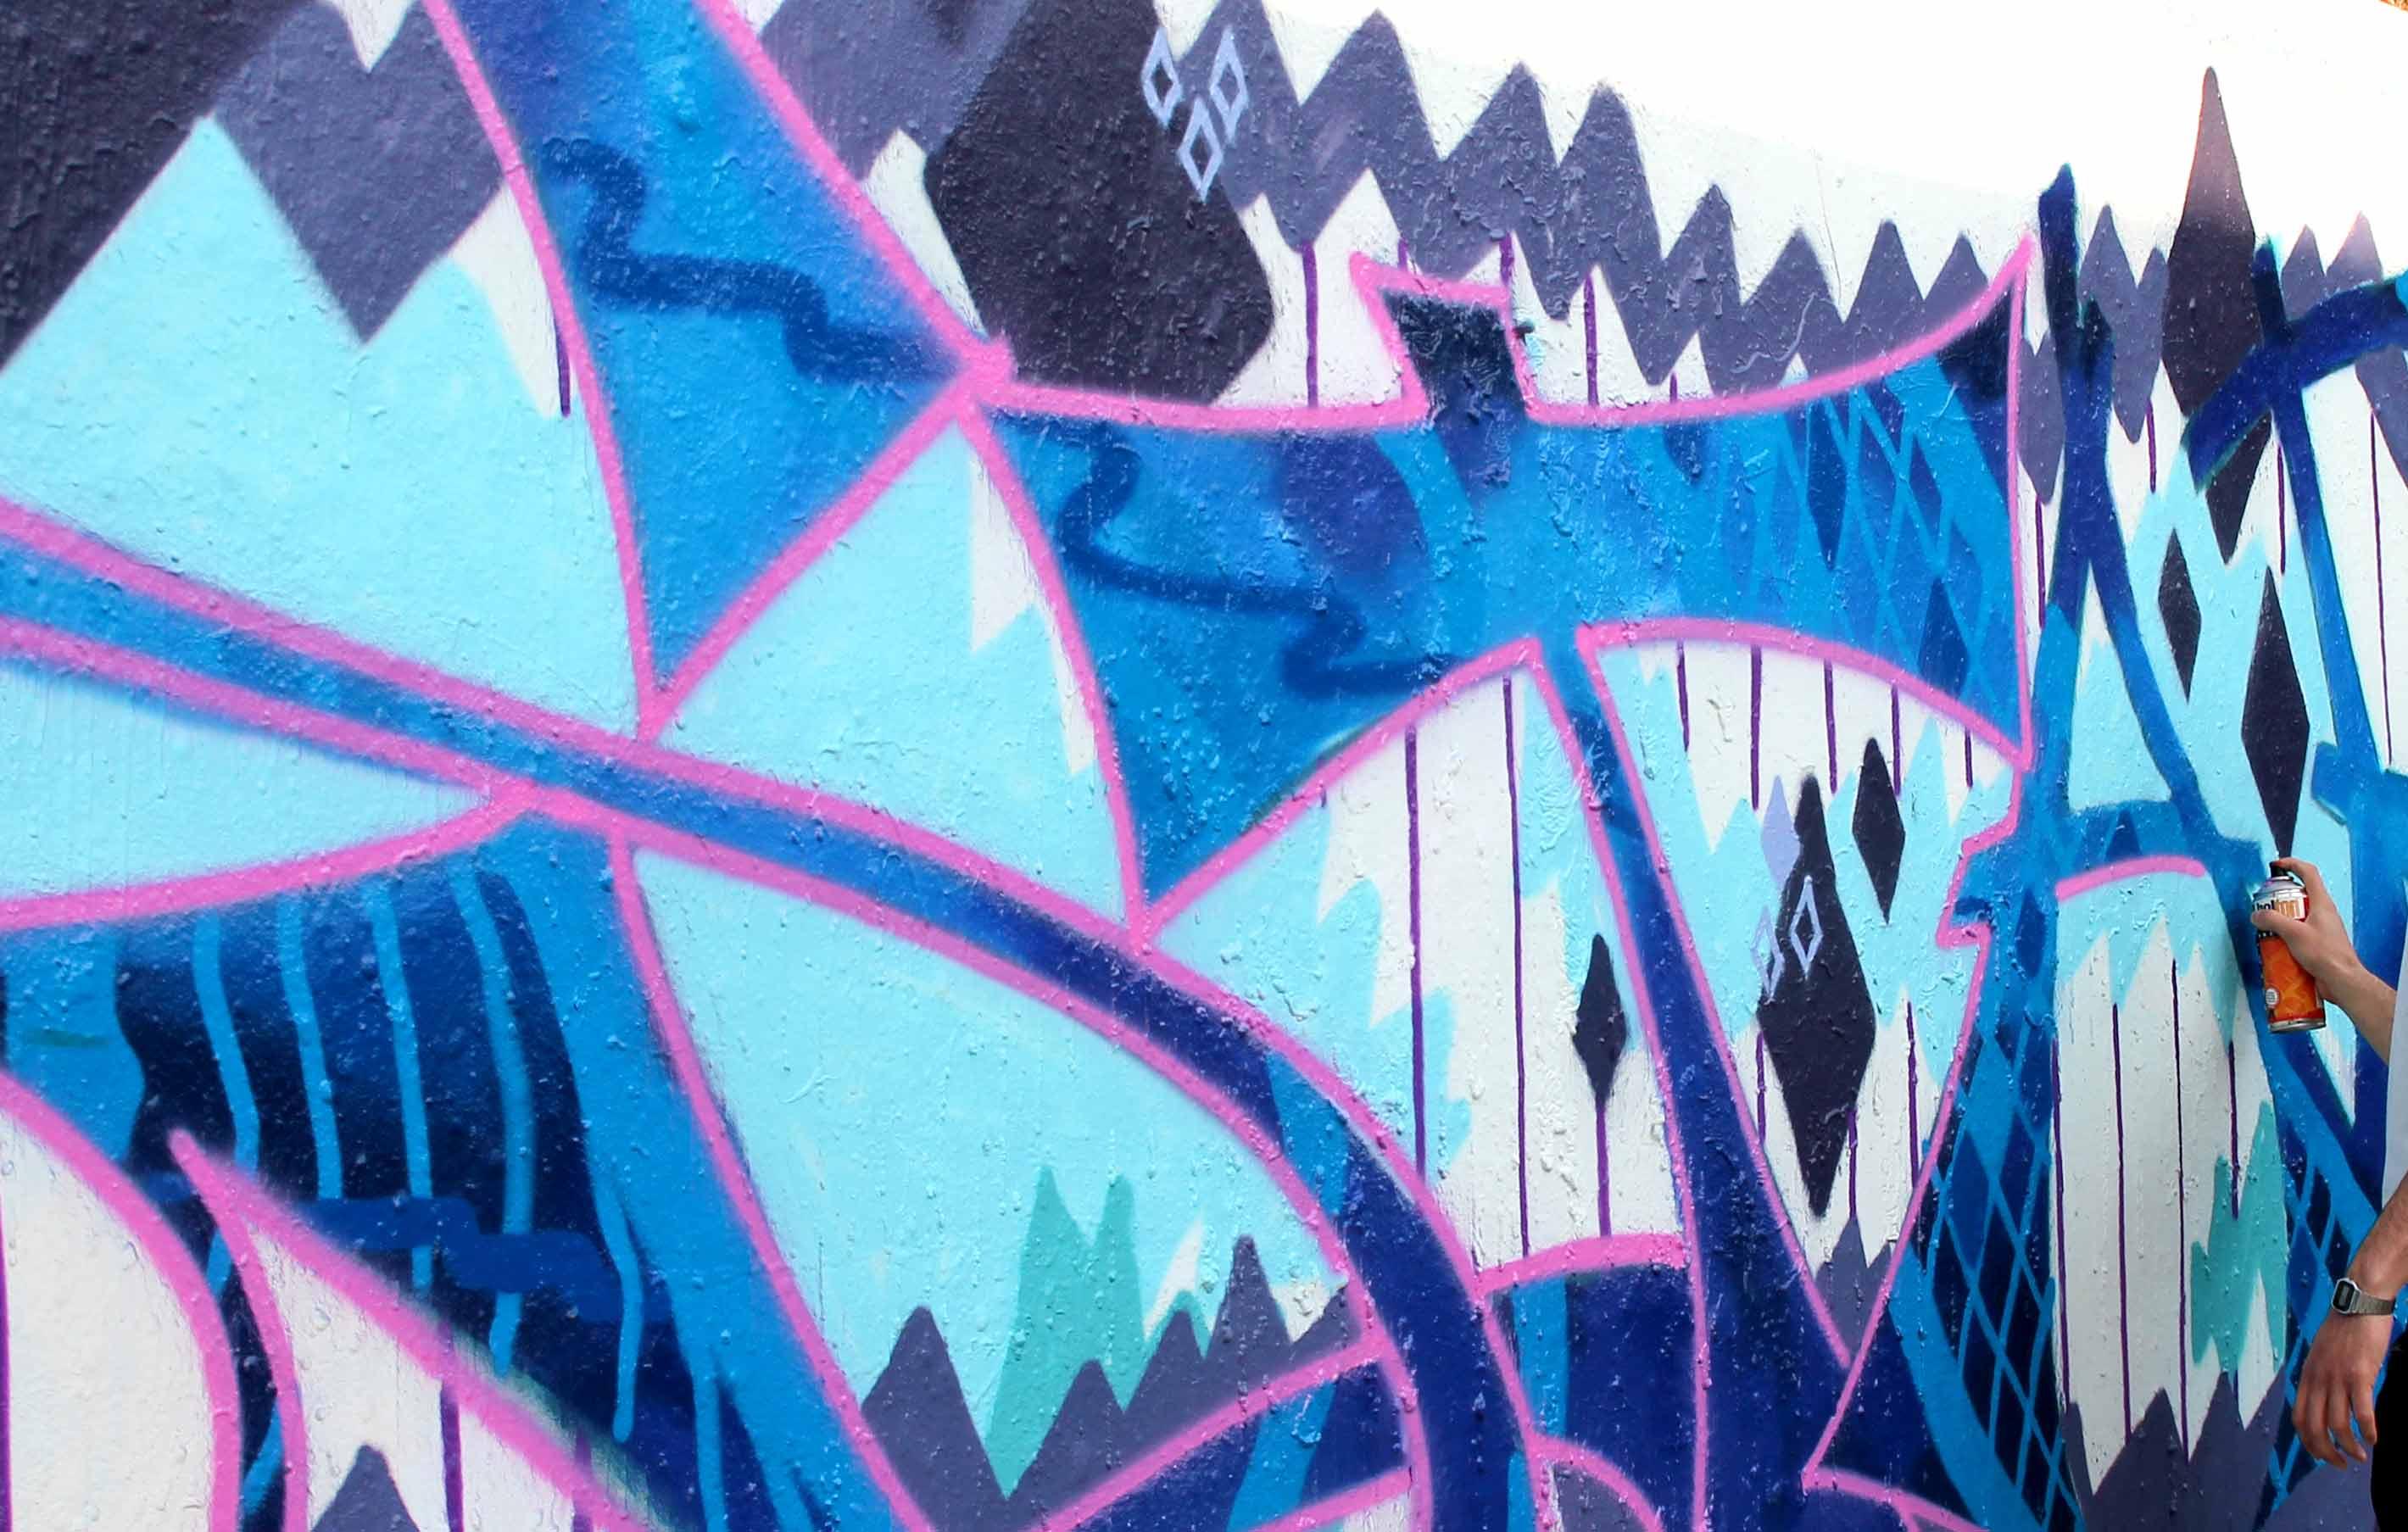 Farbkombo - professionelle Graffiti-Künstler Köln, Wandgestaltung ...